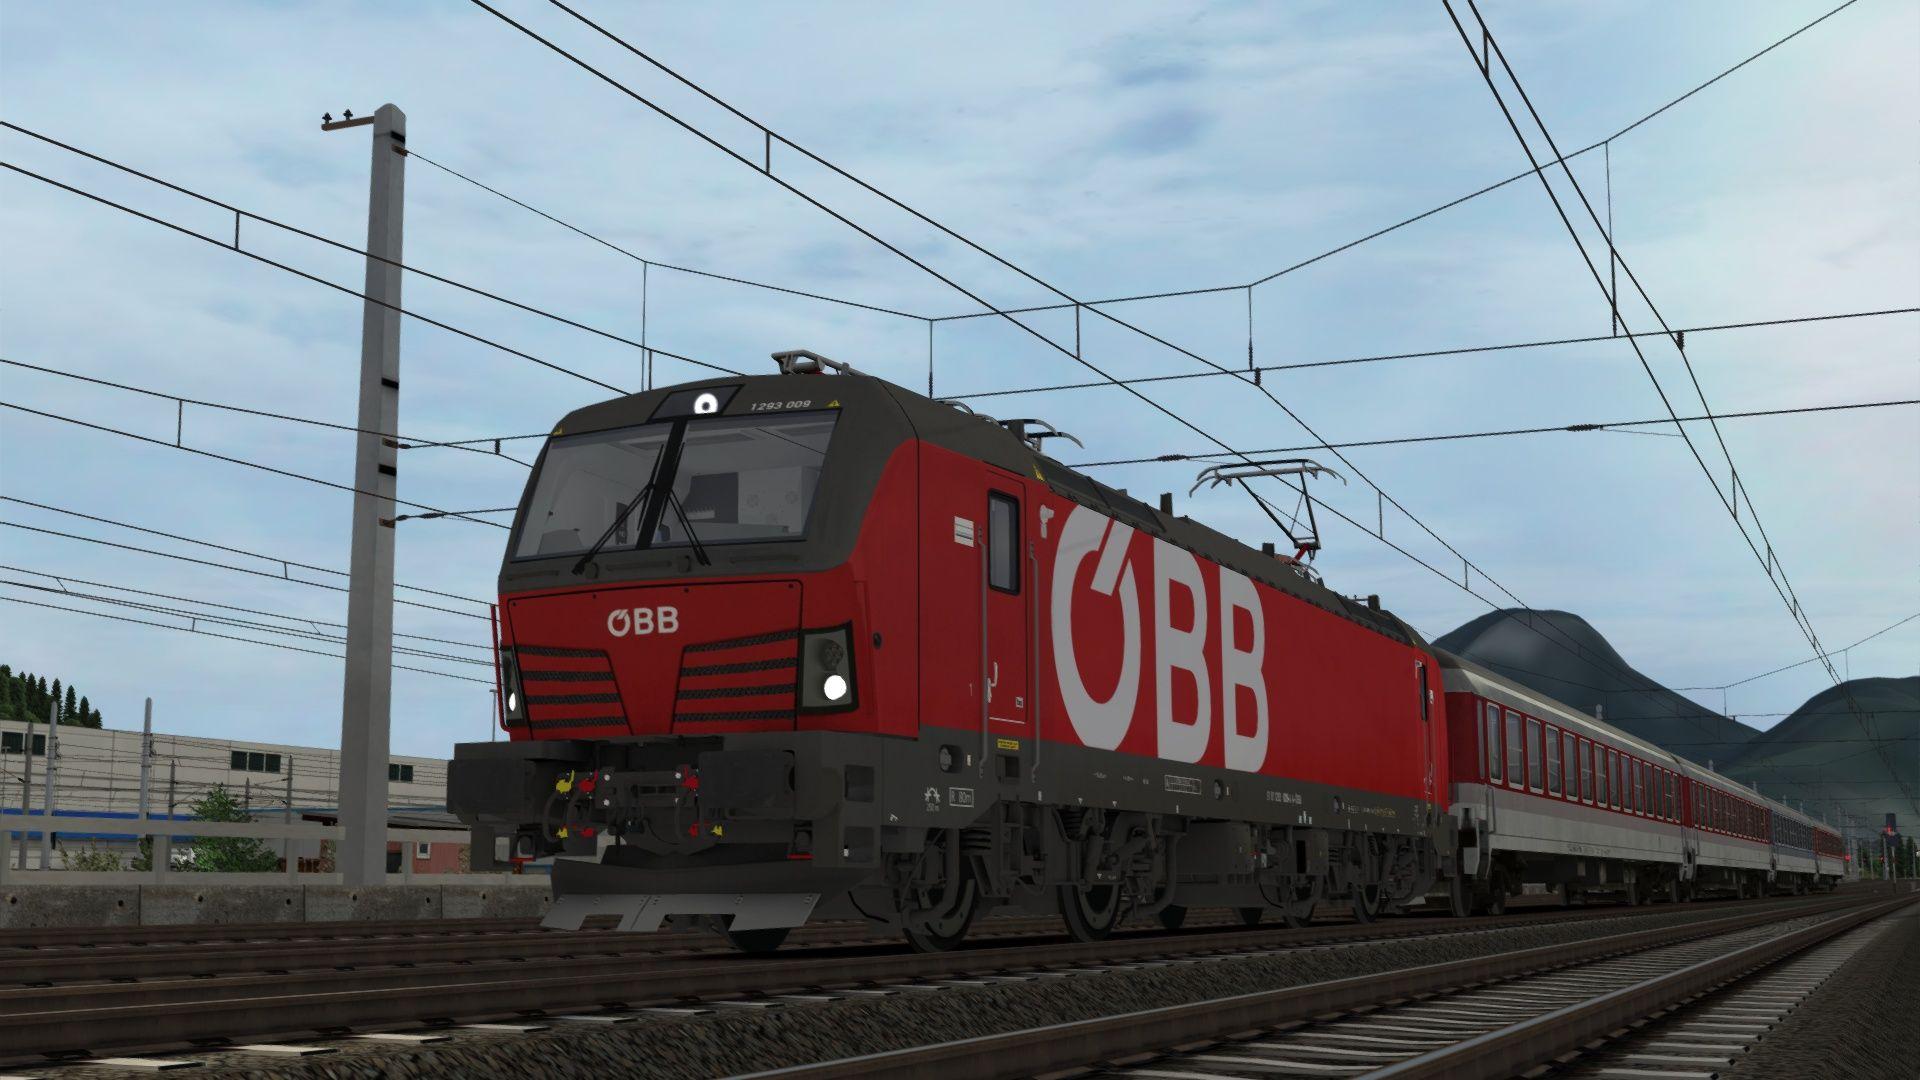 OBB12933